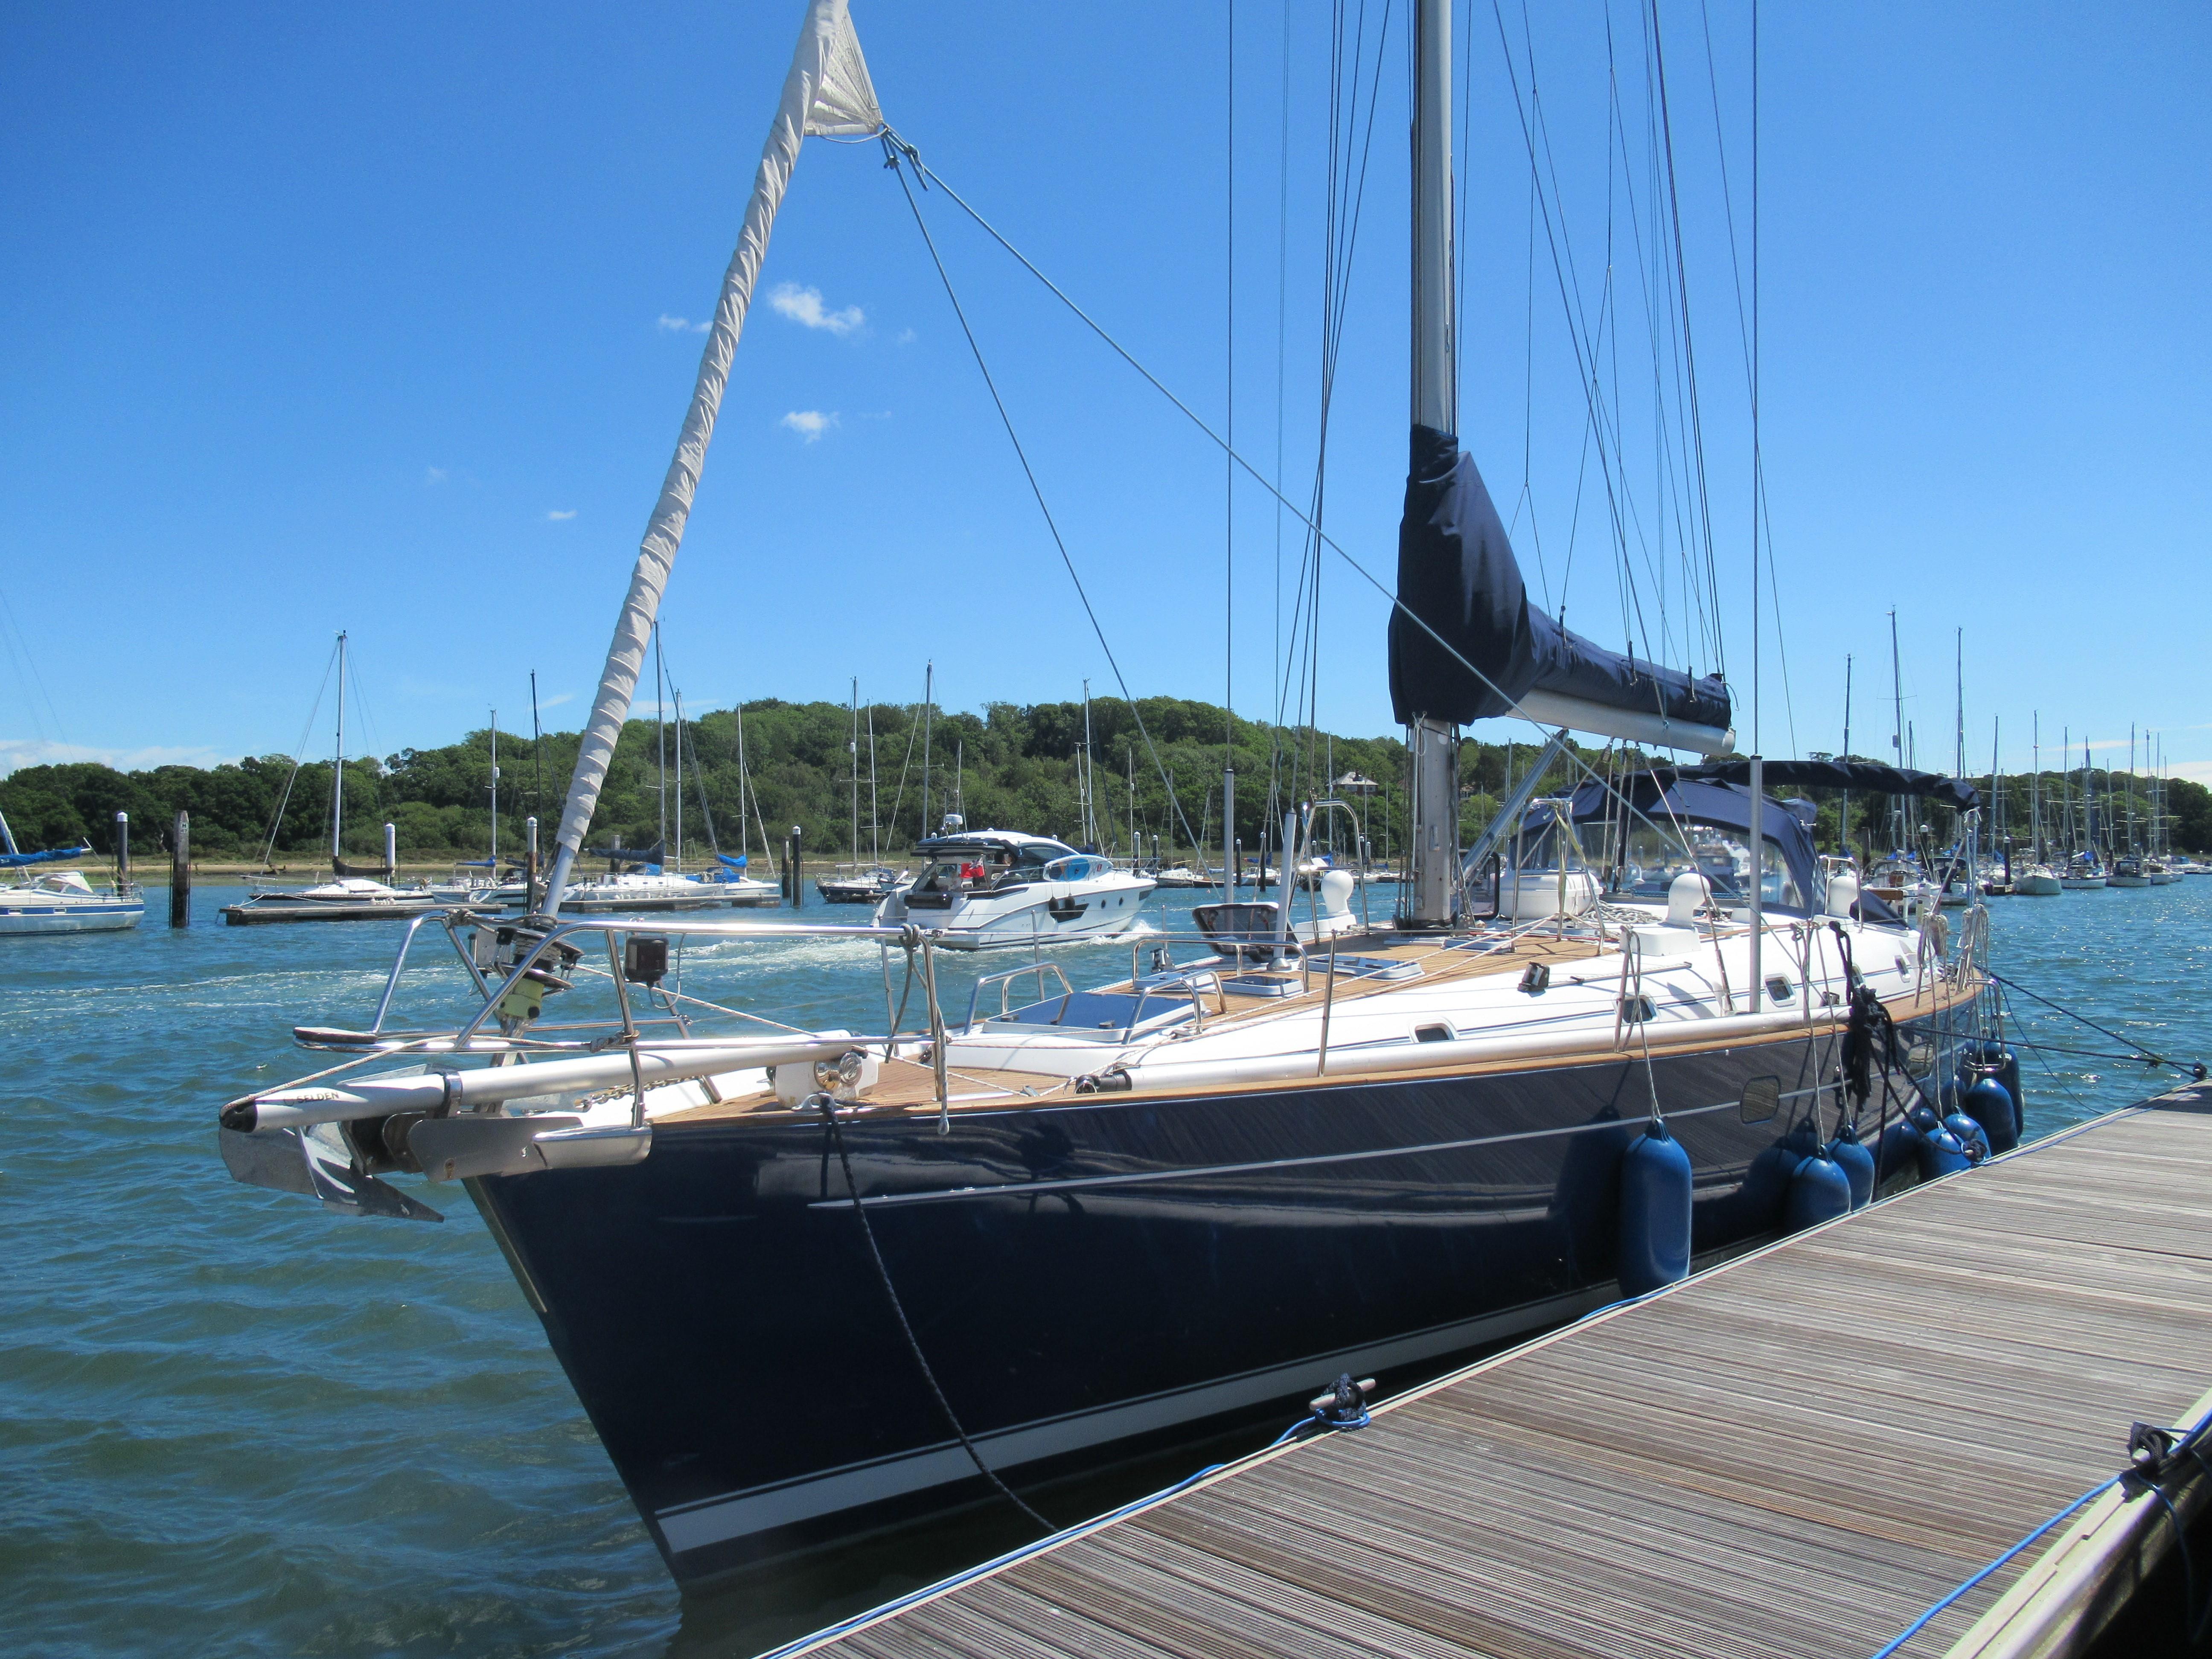 Beneteau 50 Beneteau 50 - Blue Spirit of Arne